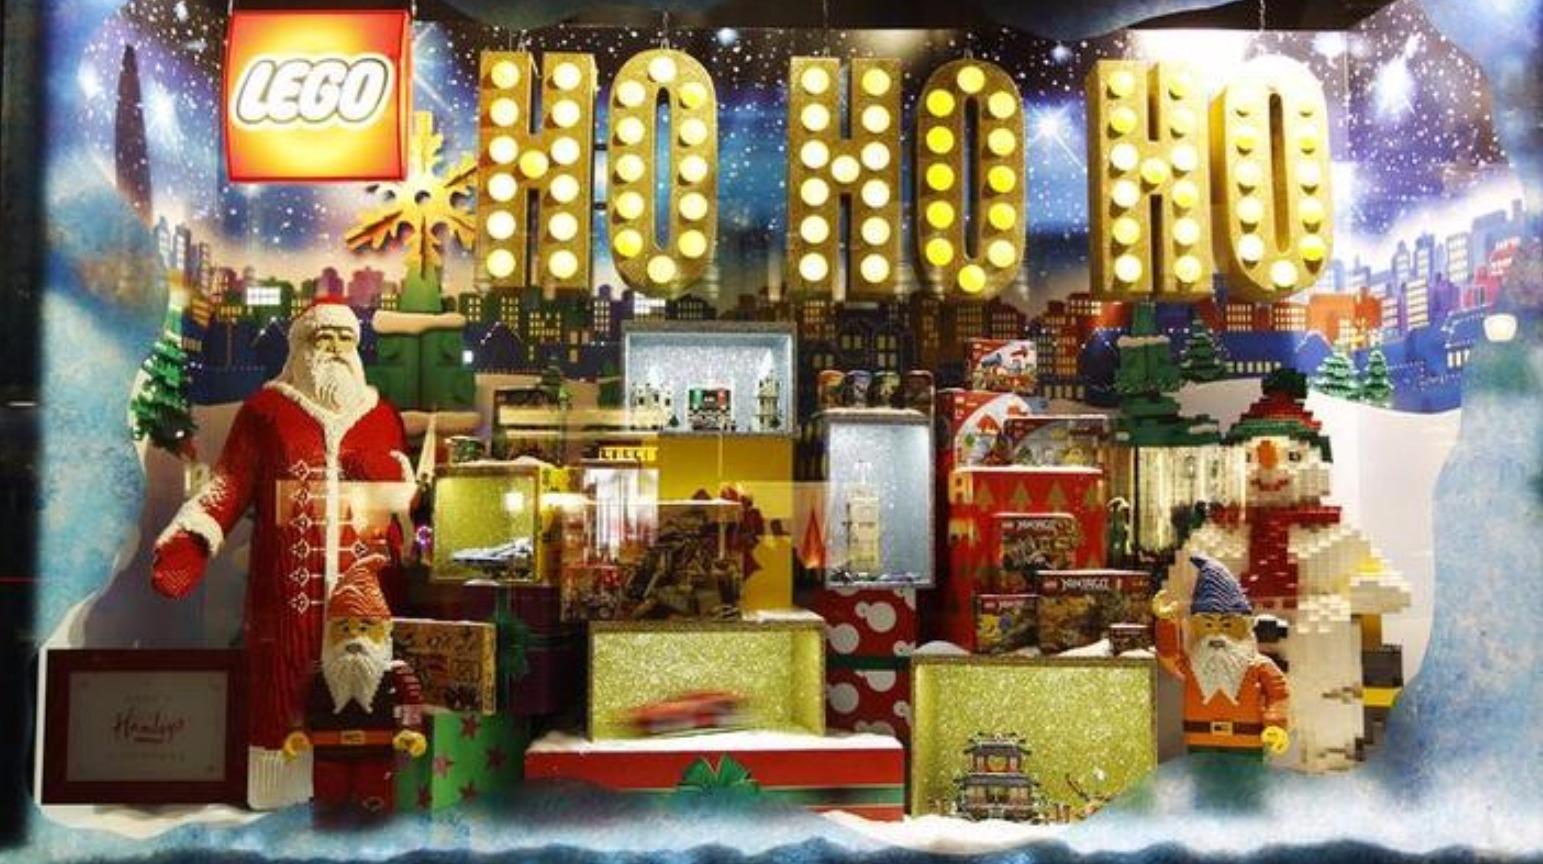 Christmas Toy Store : Lego set to run short of bricks this christmas itv news